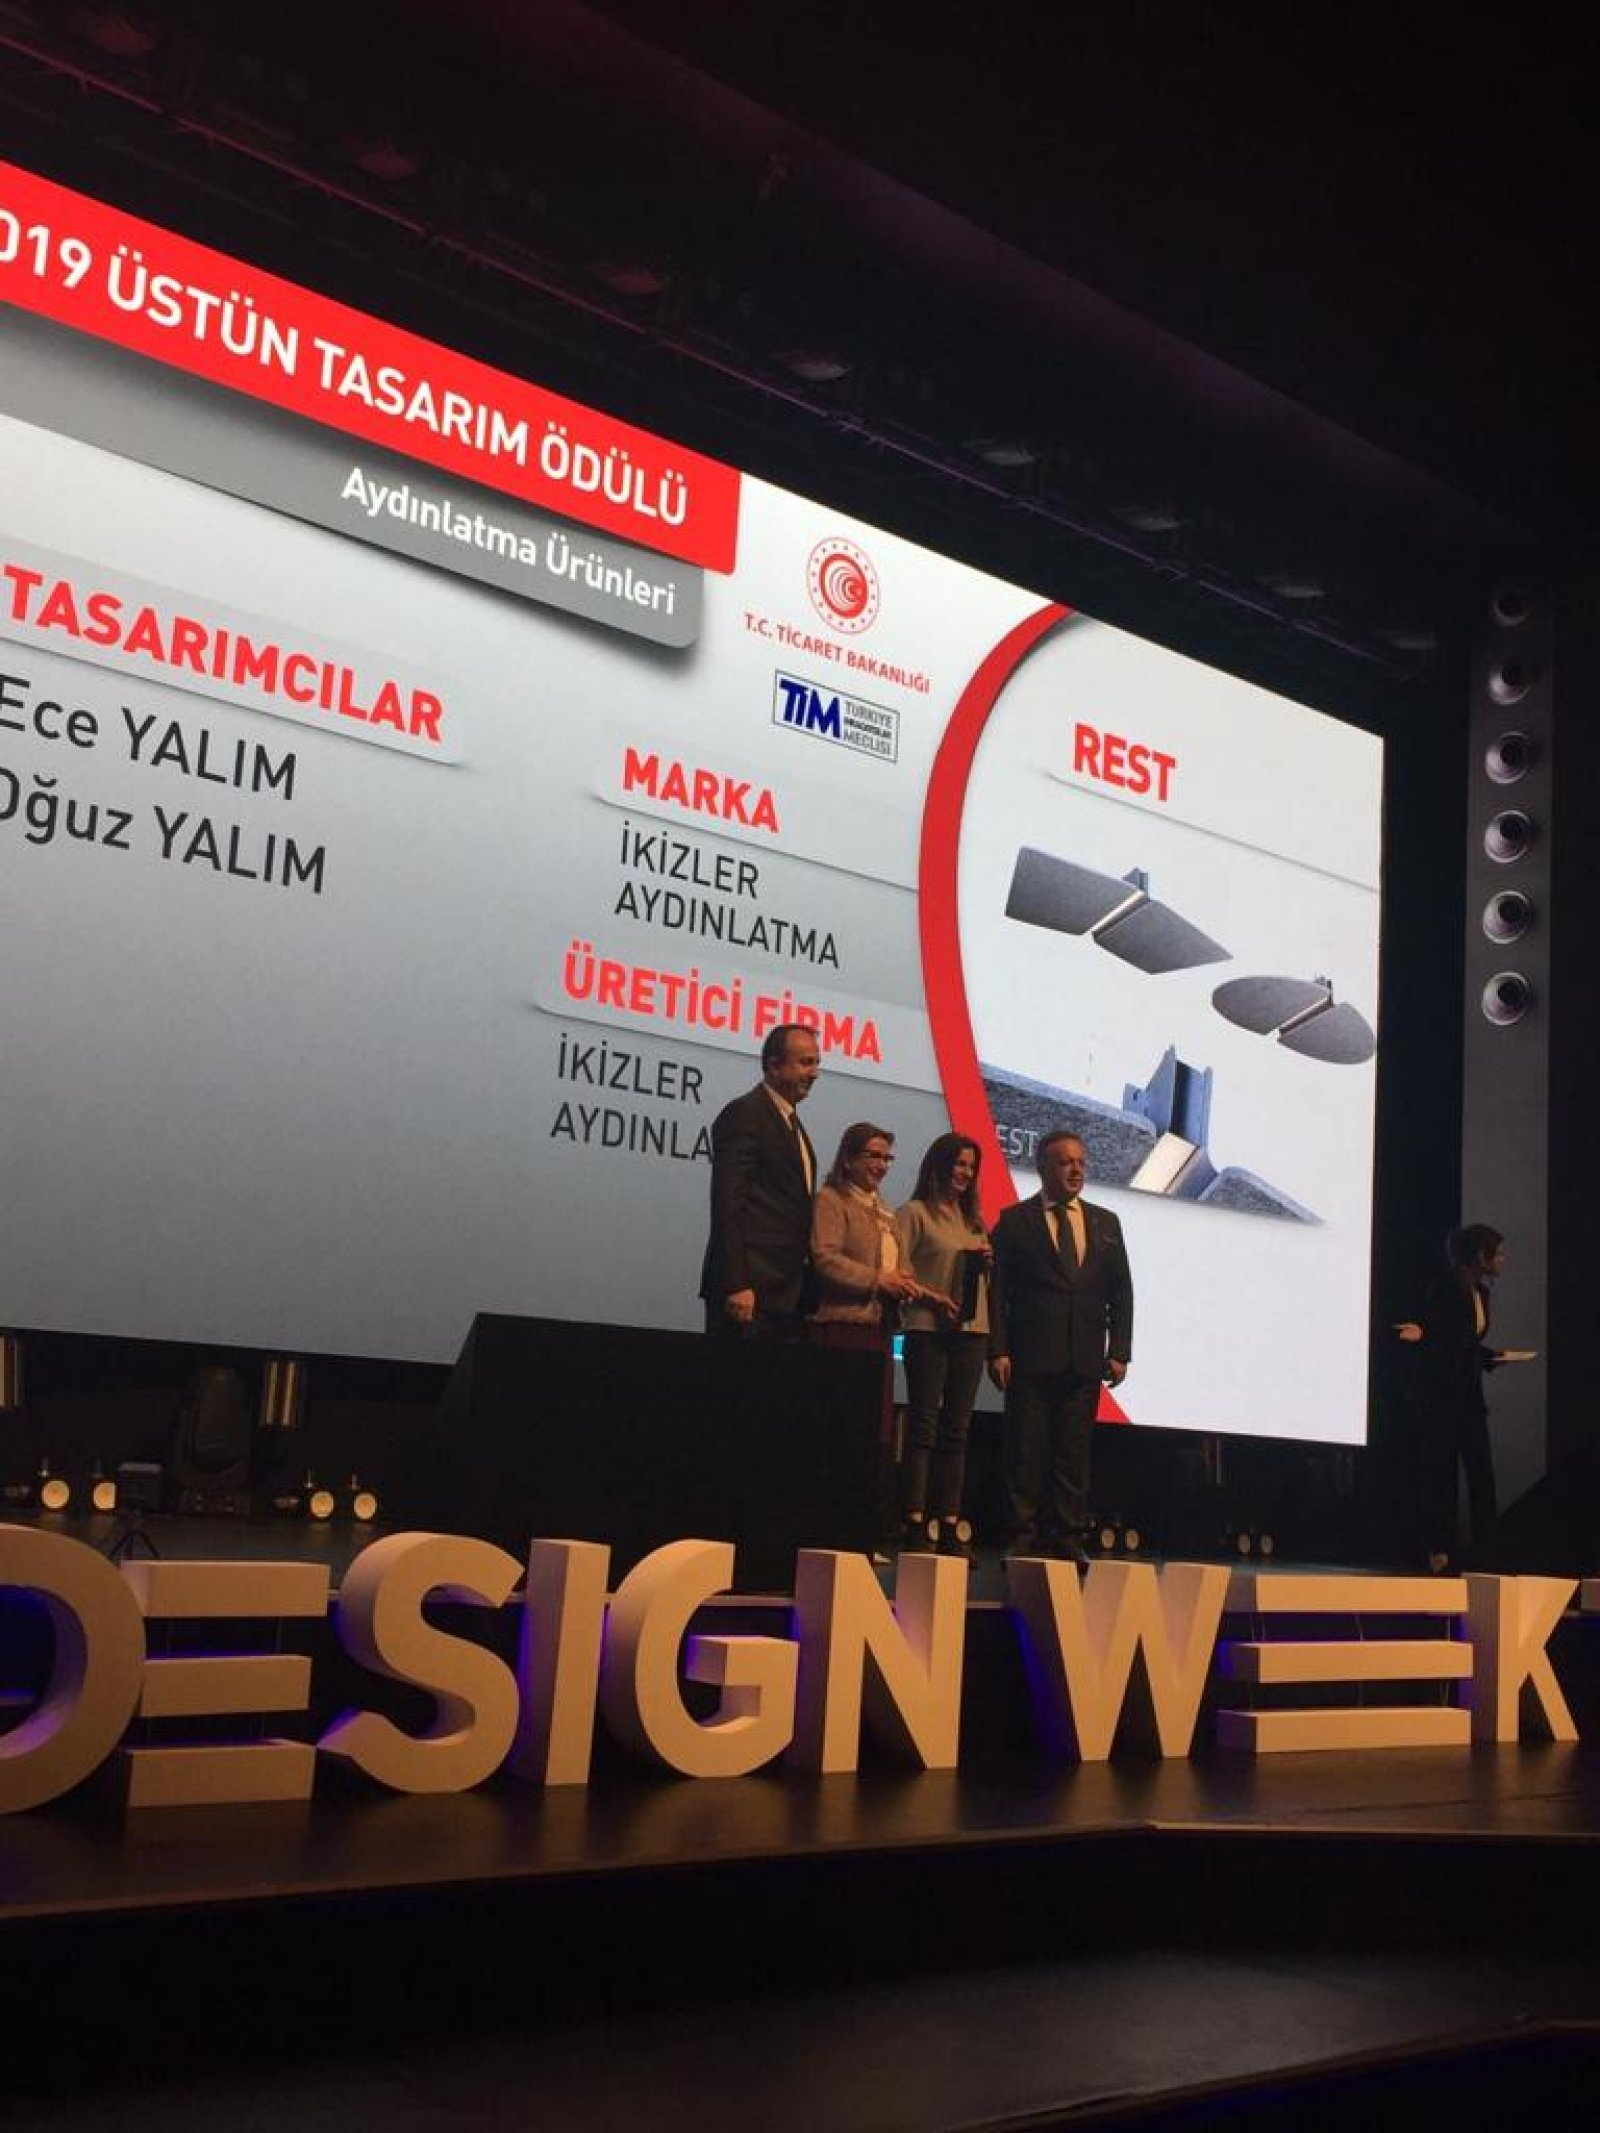 Rest -R Superior Design Award